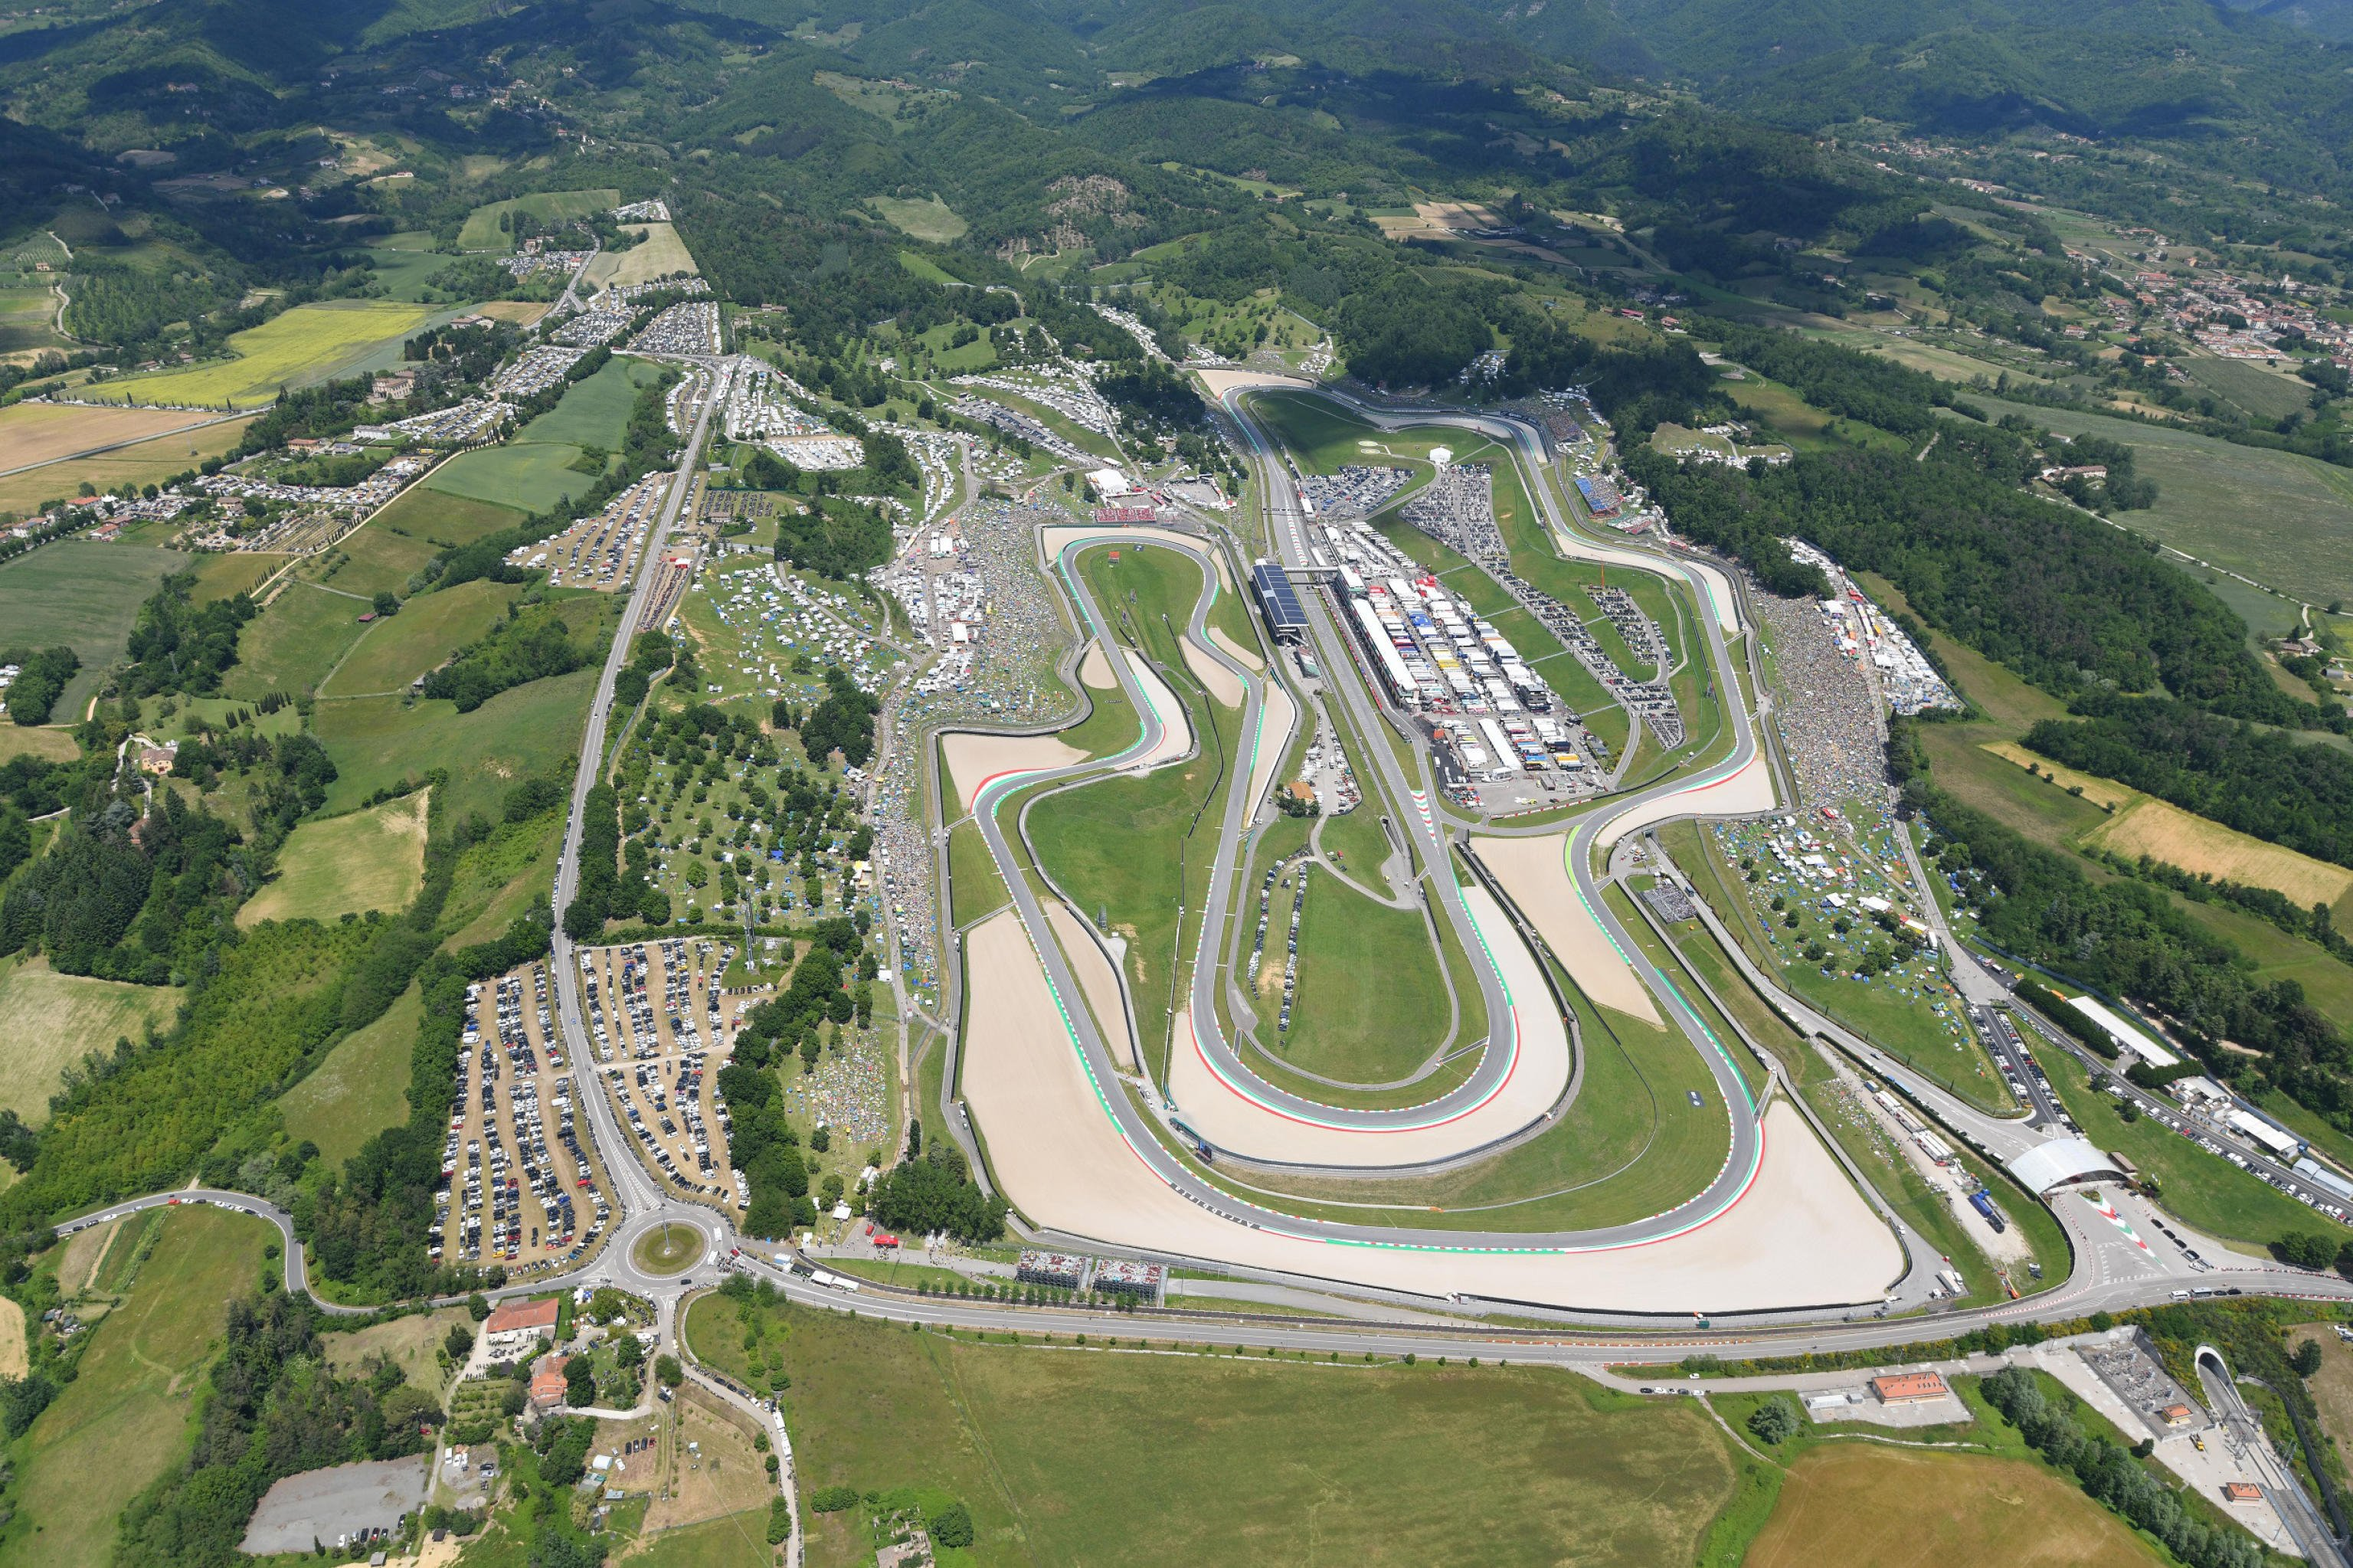 F1 Toscana 2020, Prove Libere - Diretta esclusiva Sky Sport